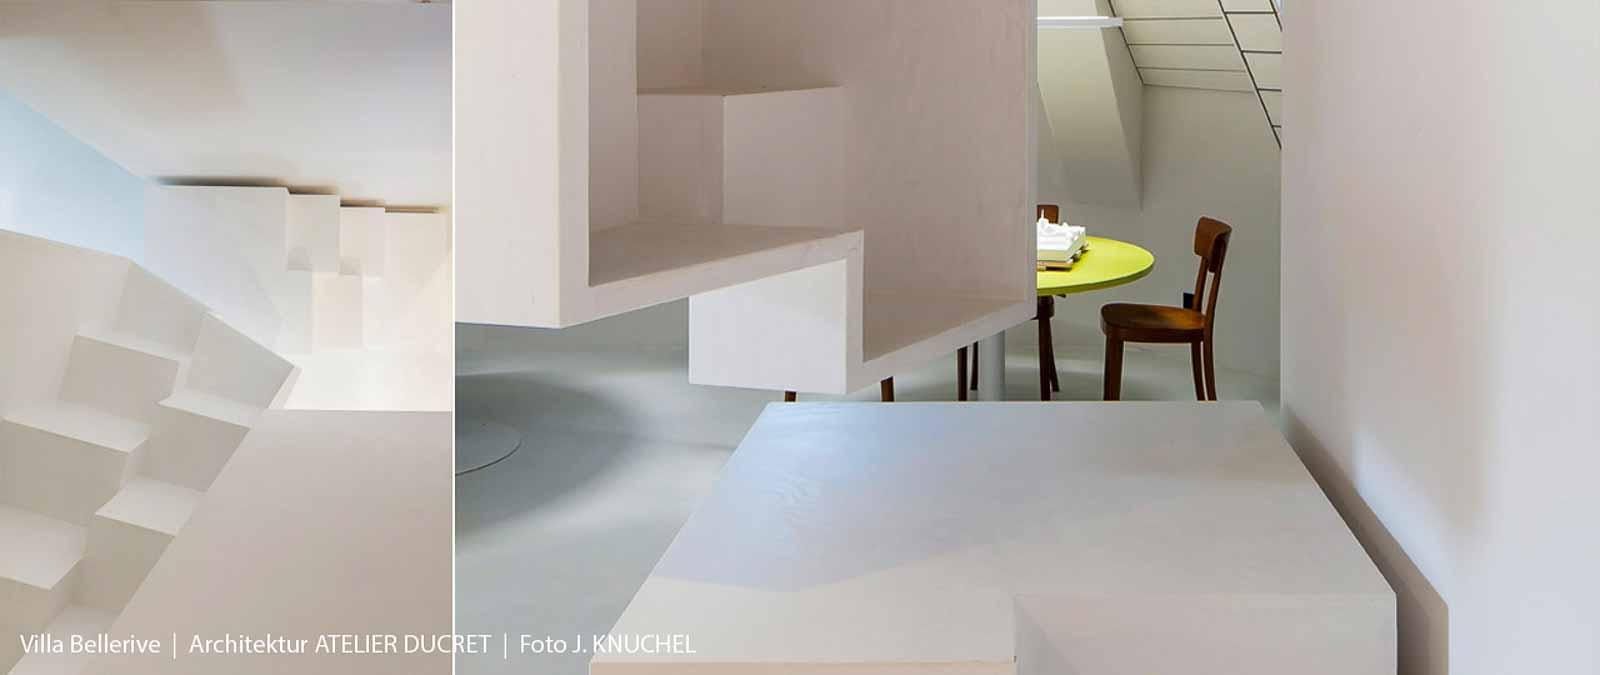 Wooddesign_Holzdesign_Treppe_Holztreppe_schwebend_2-teilig_atelierducret_freiburg(10)